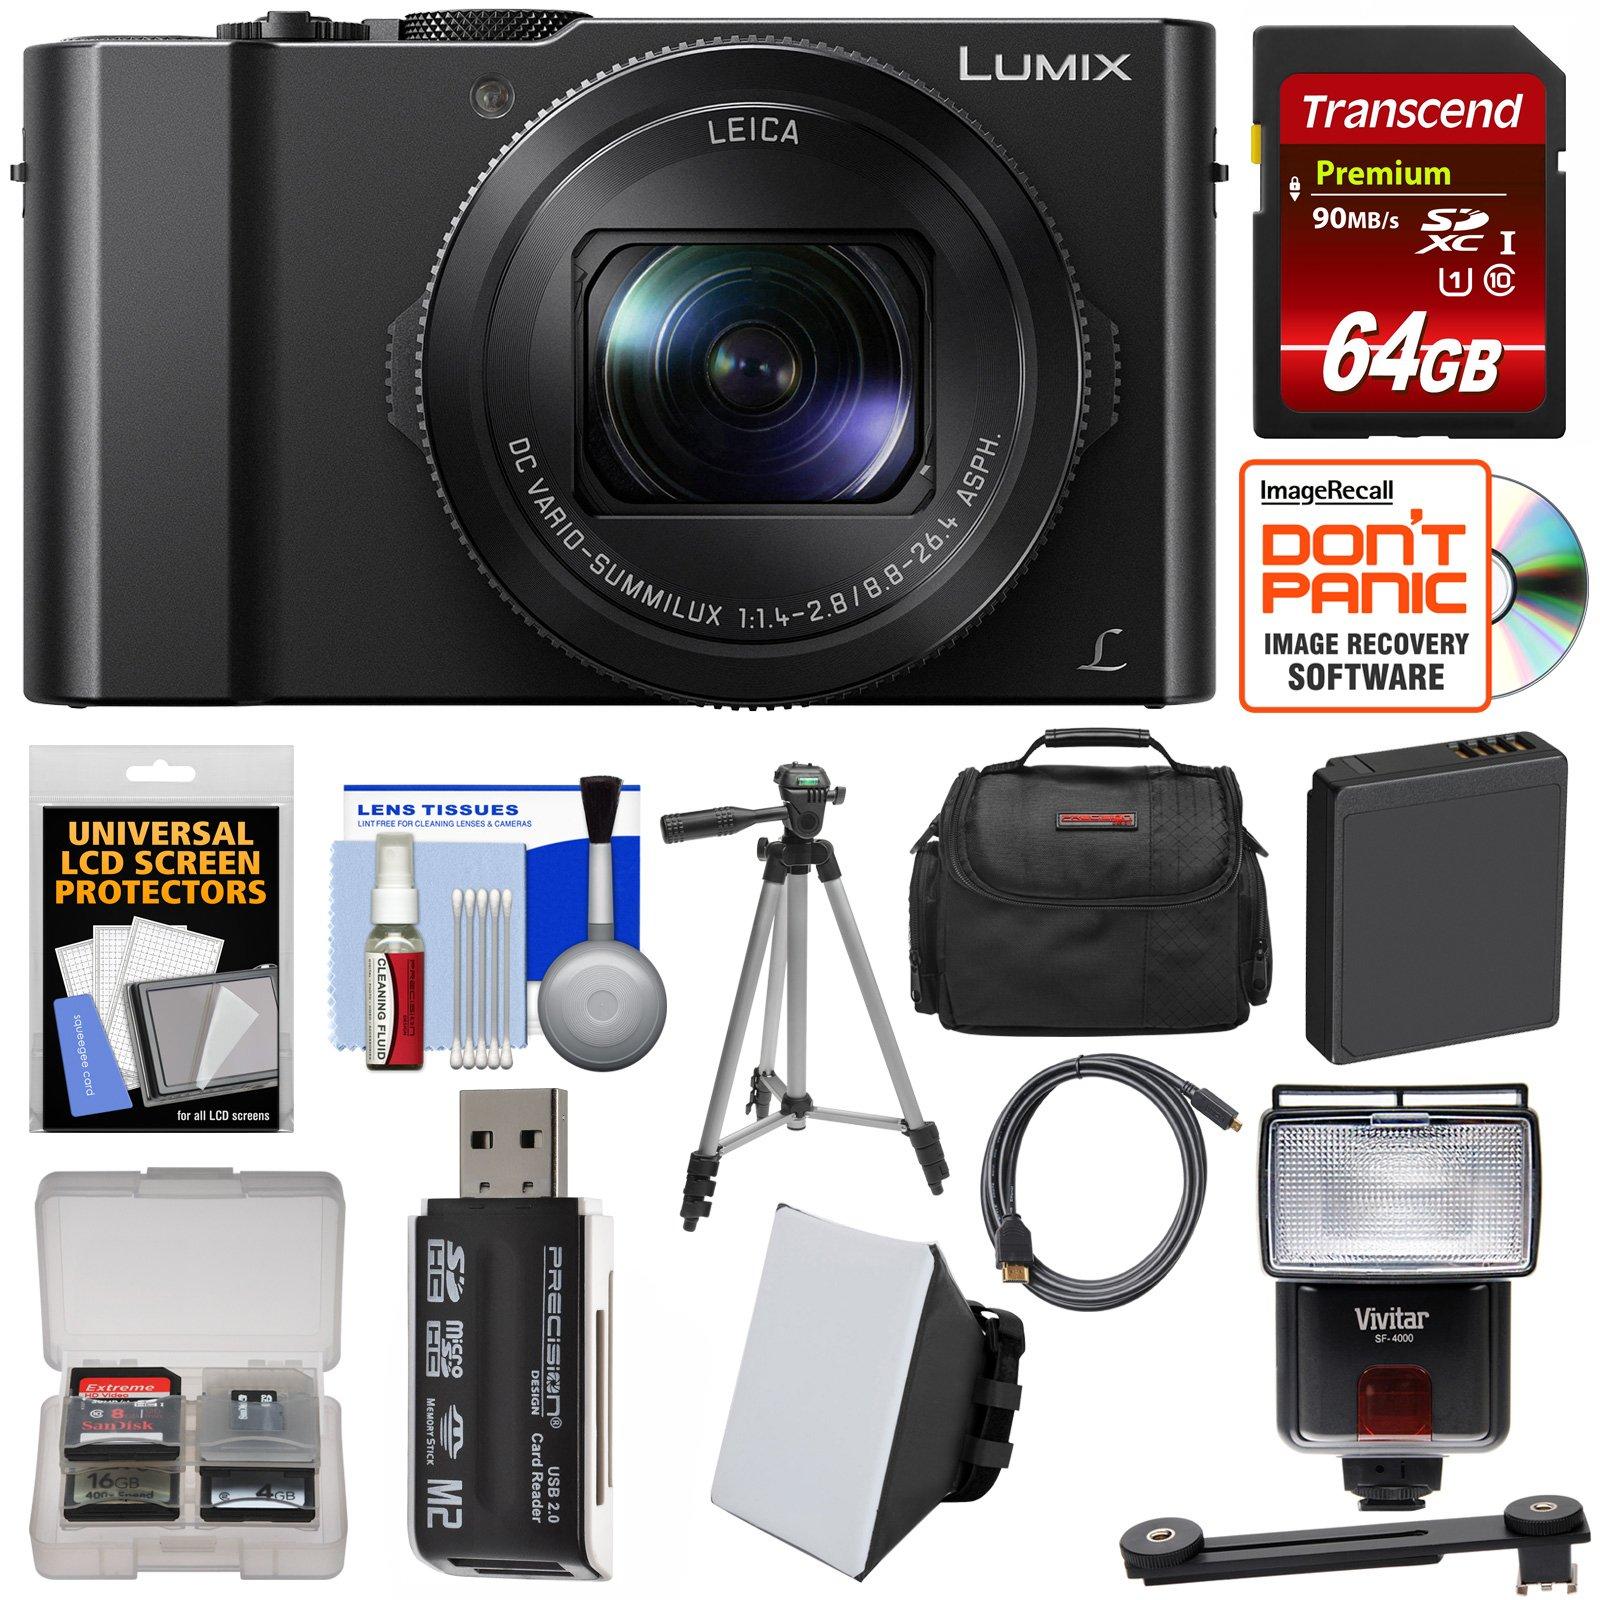 Panasonic Lumix DMC-LX10 4K Wi-Fi Digital Camera with 64GB Card + Battery + Case + Tripod + Flash + Kit